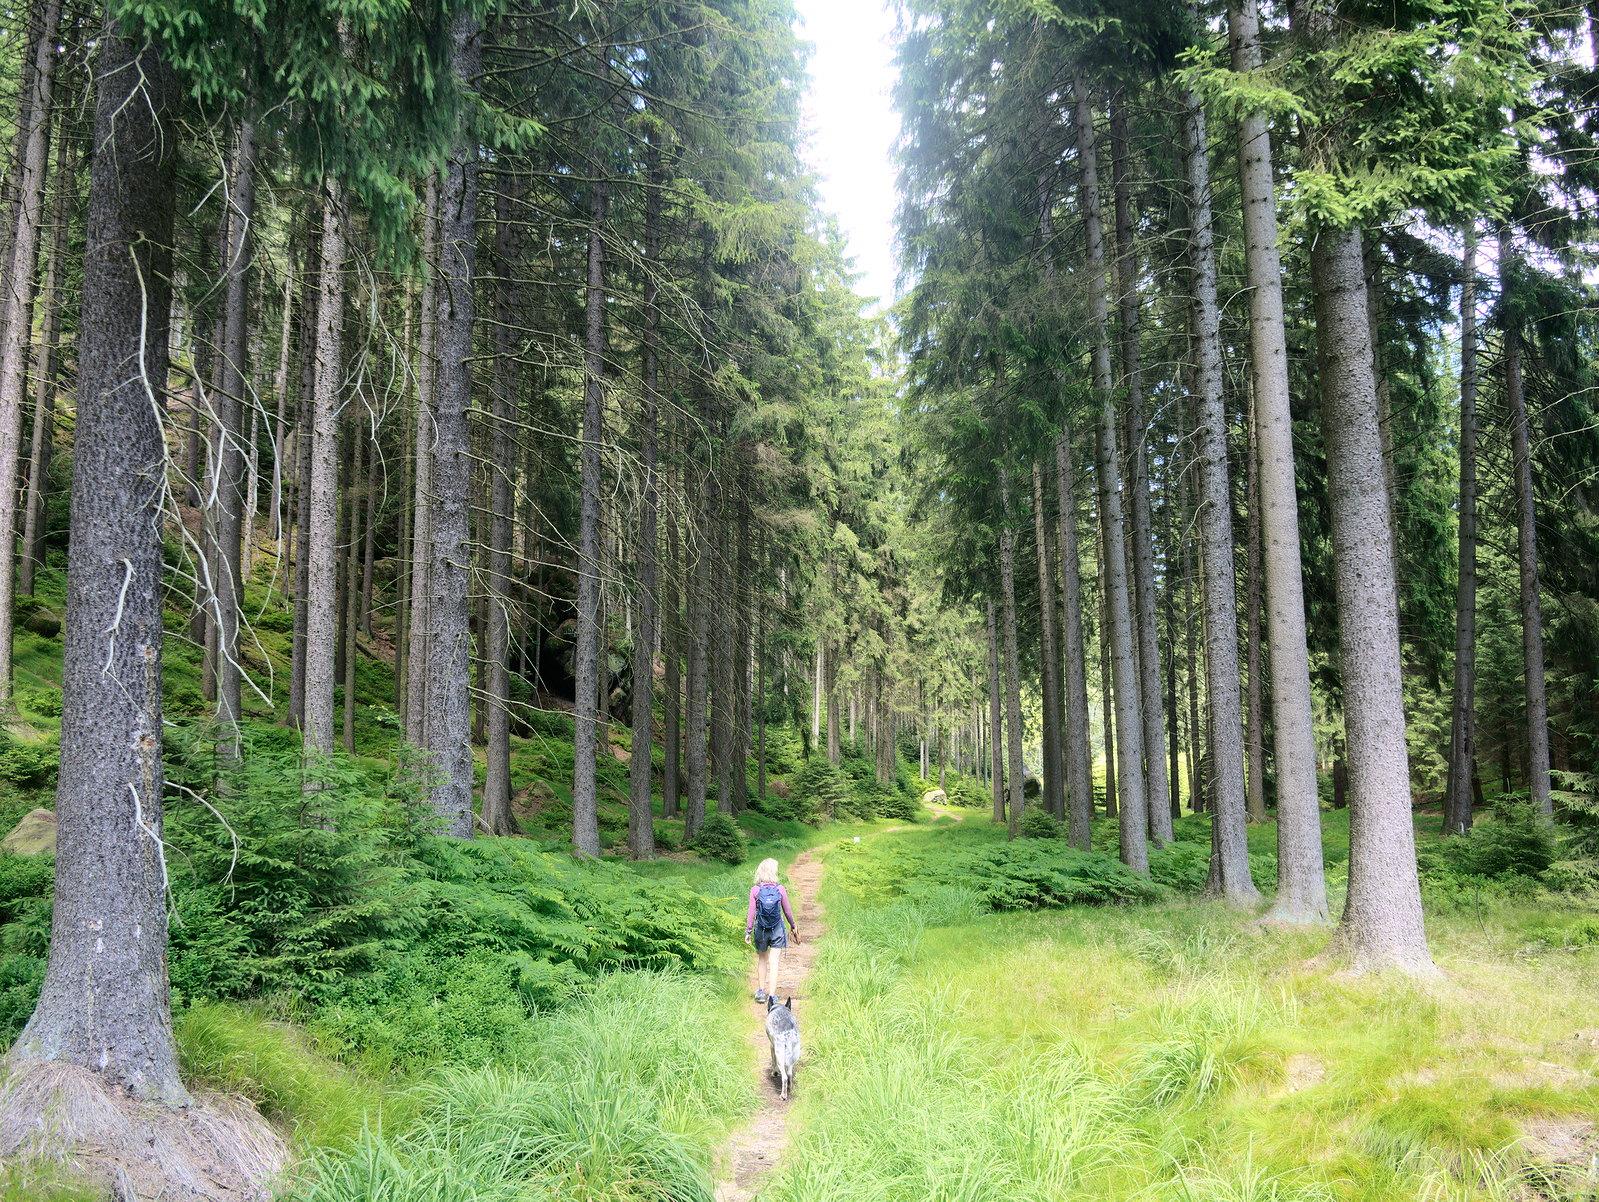 Lužické hory Zittauer Gebirge pies